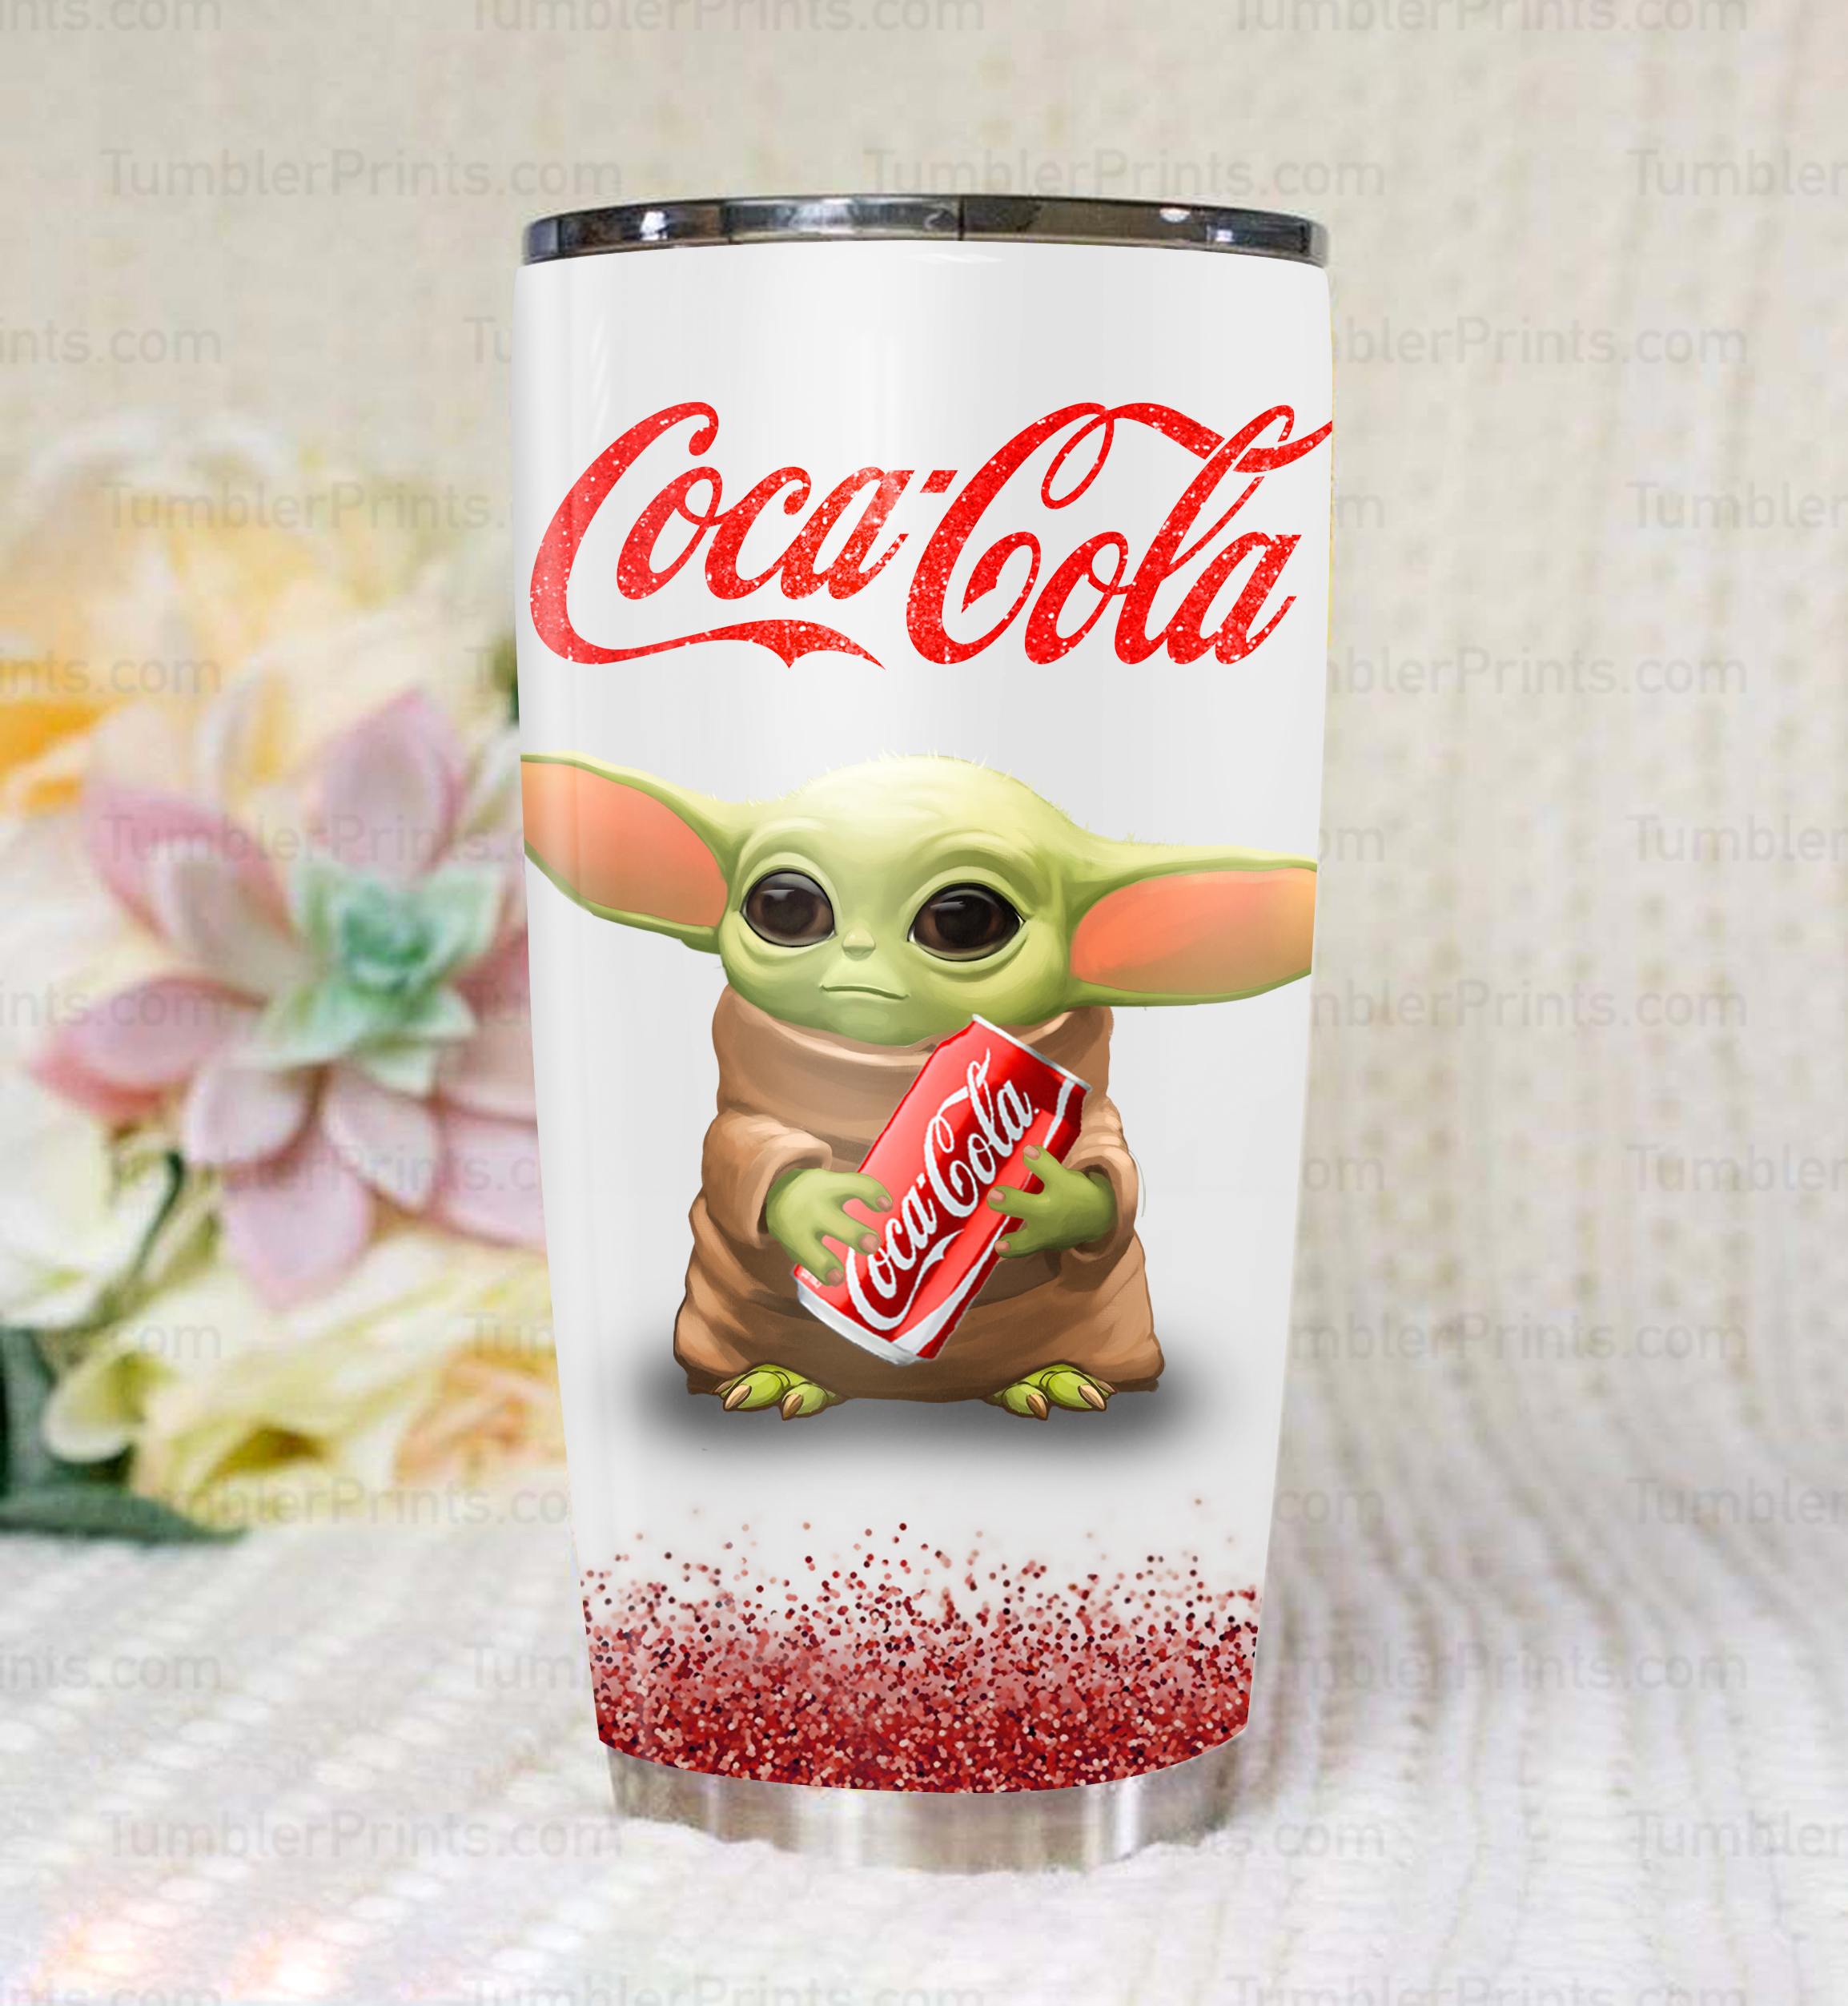 Baby yoda hold coca cola steel tumbler 2